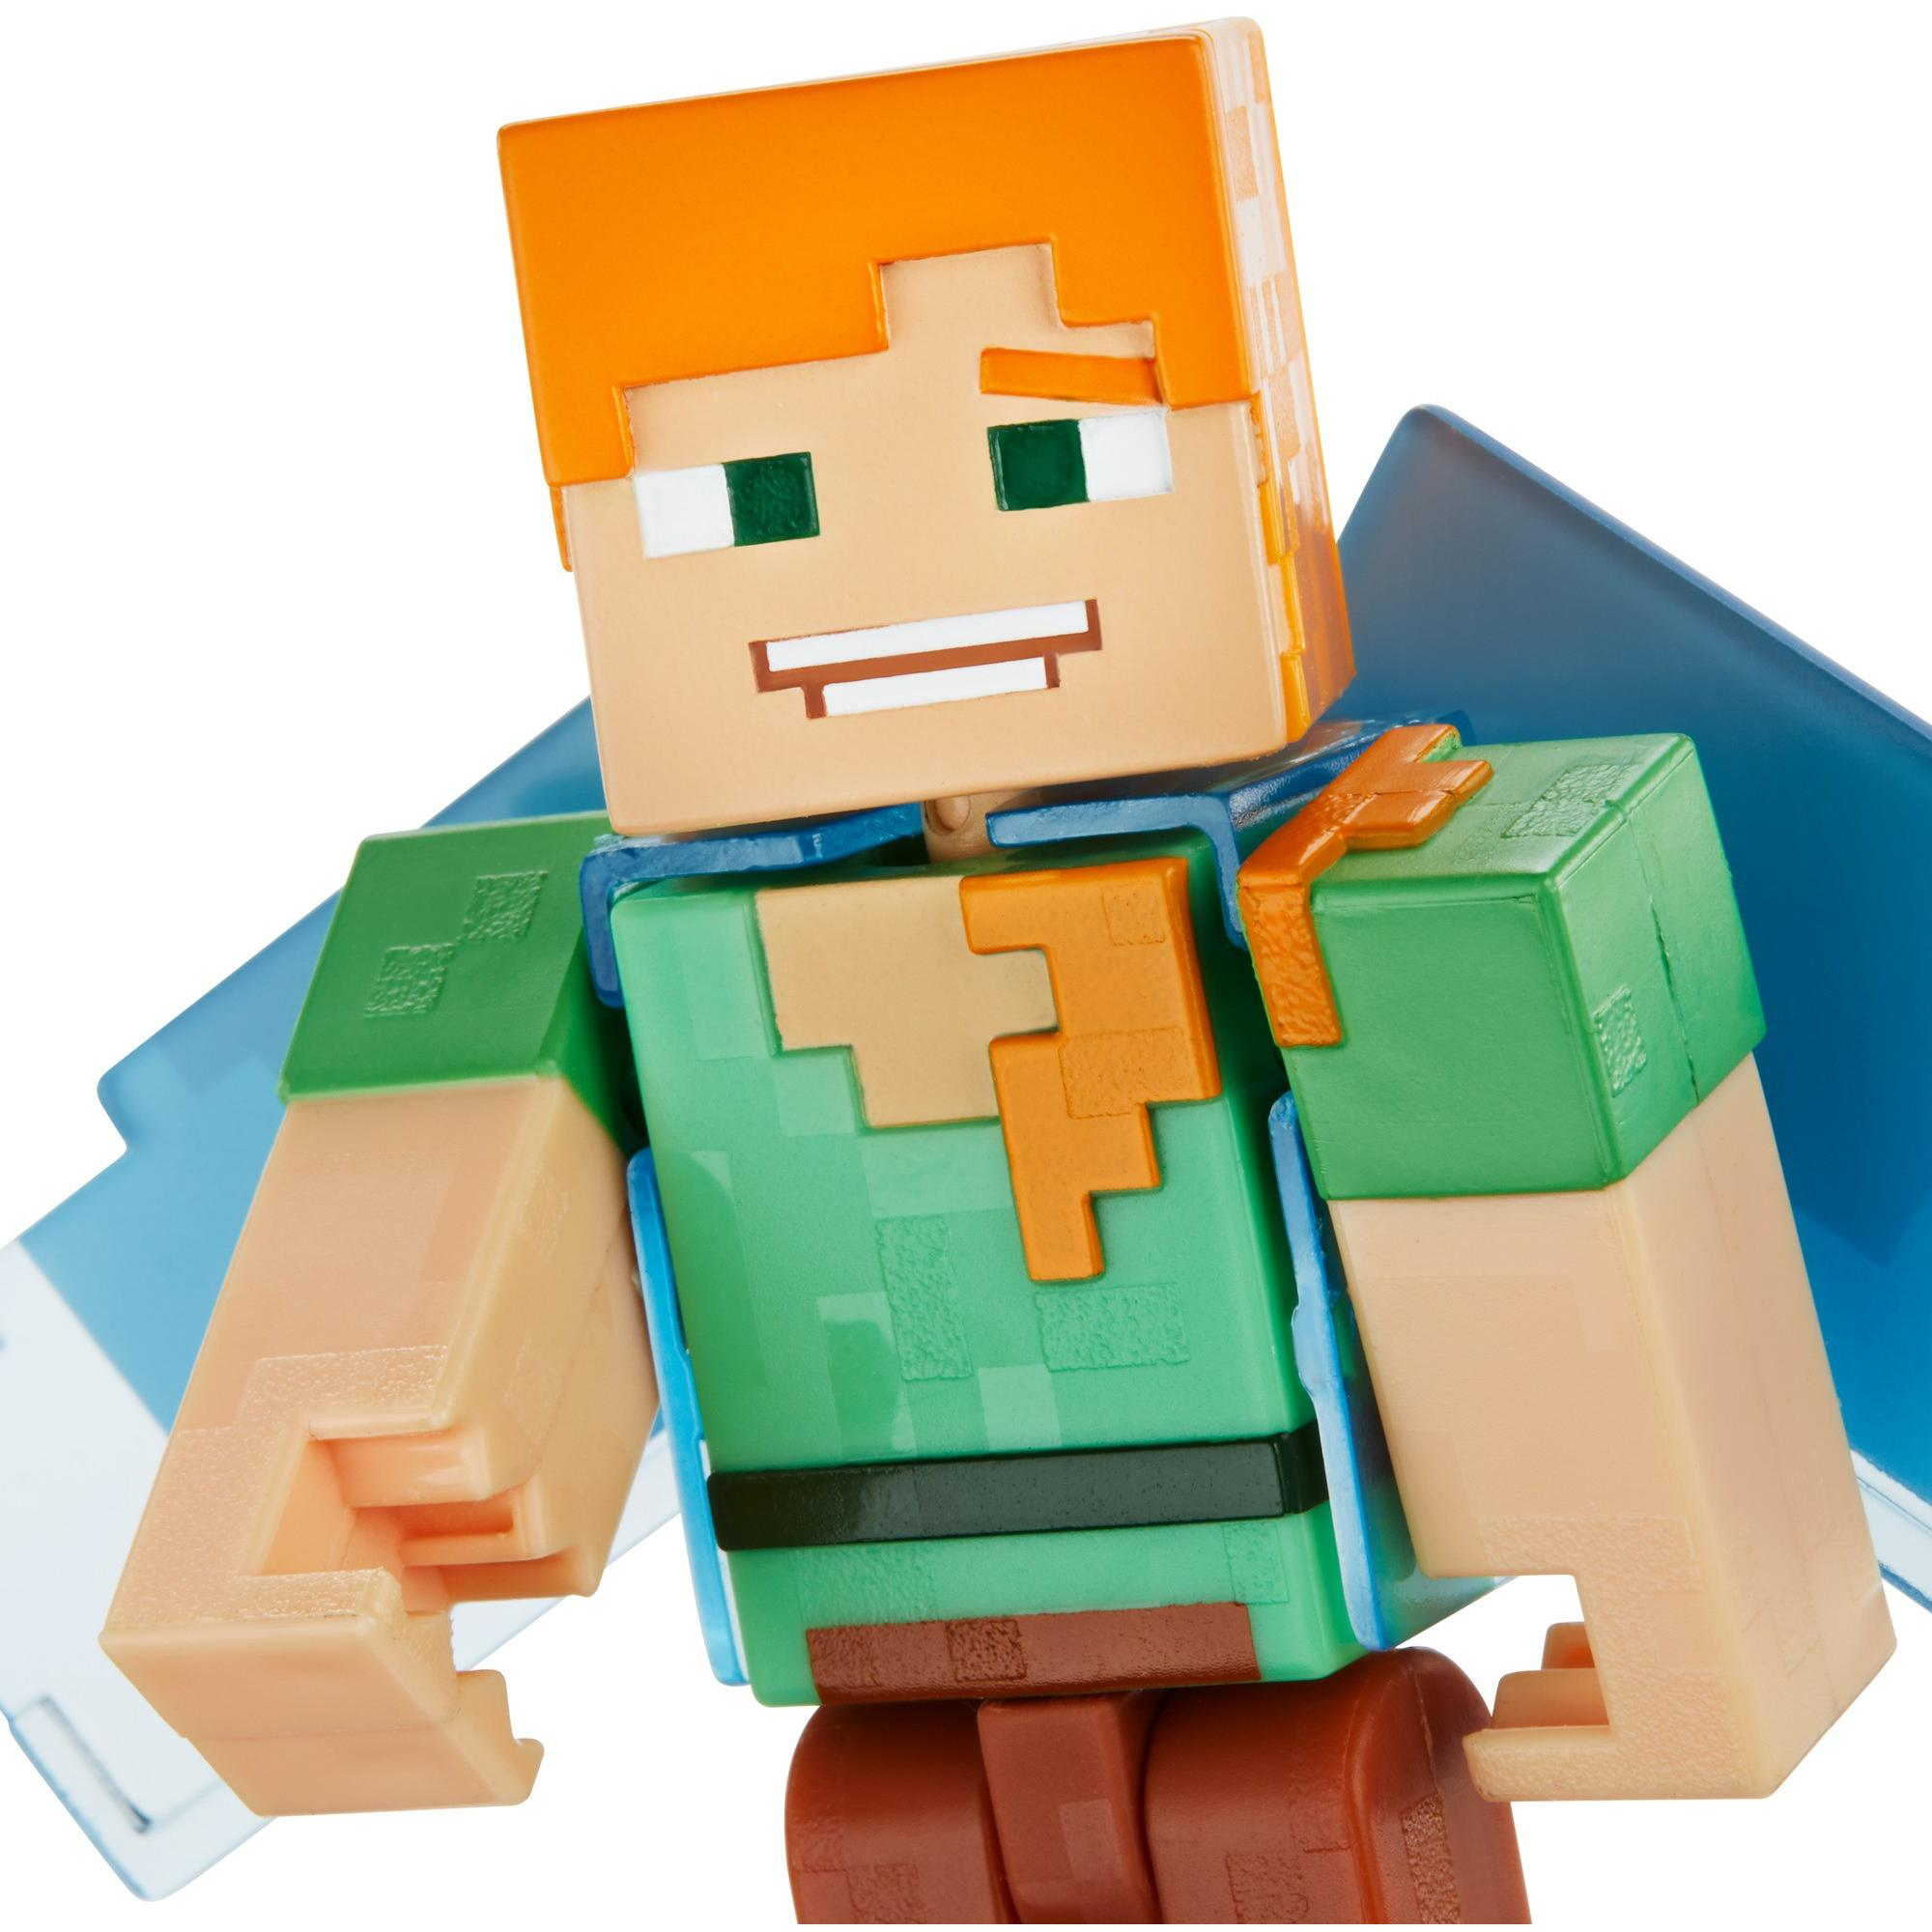 2019 Minecraft Alex Elytra Comic Maker Book Action Figure Damaged Packaging